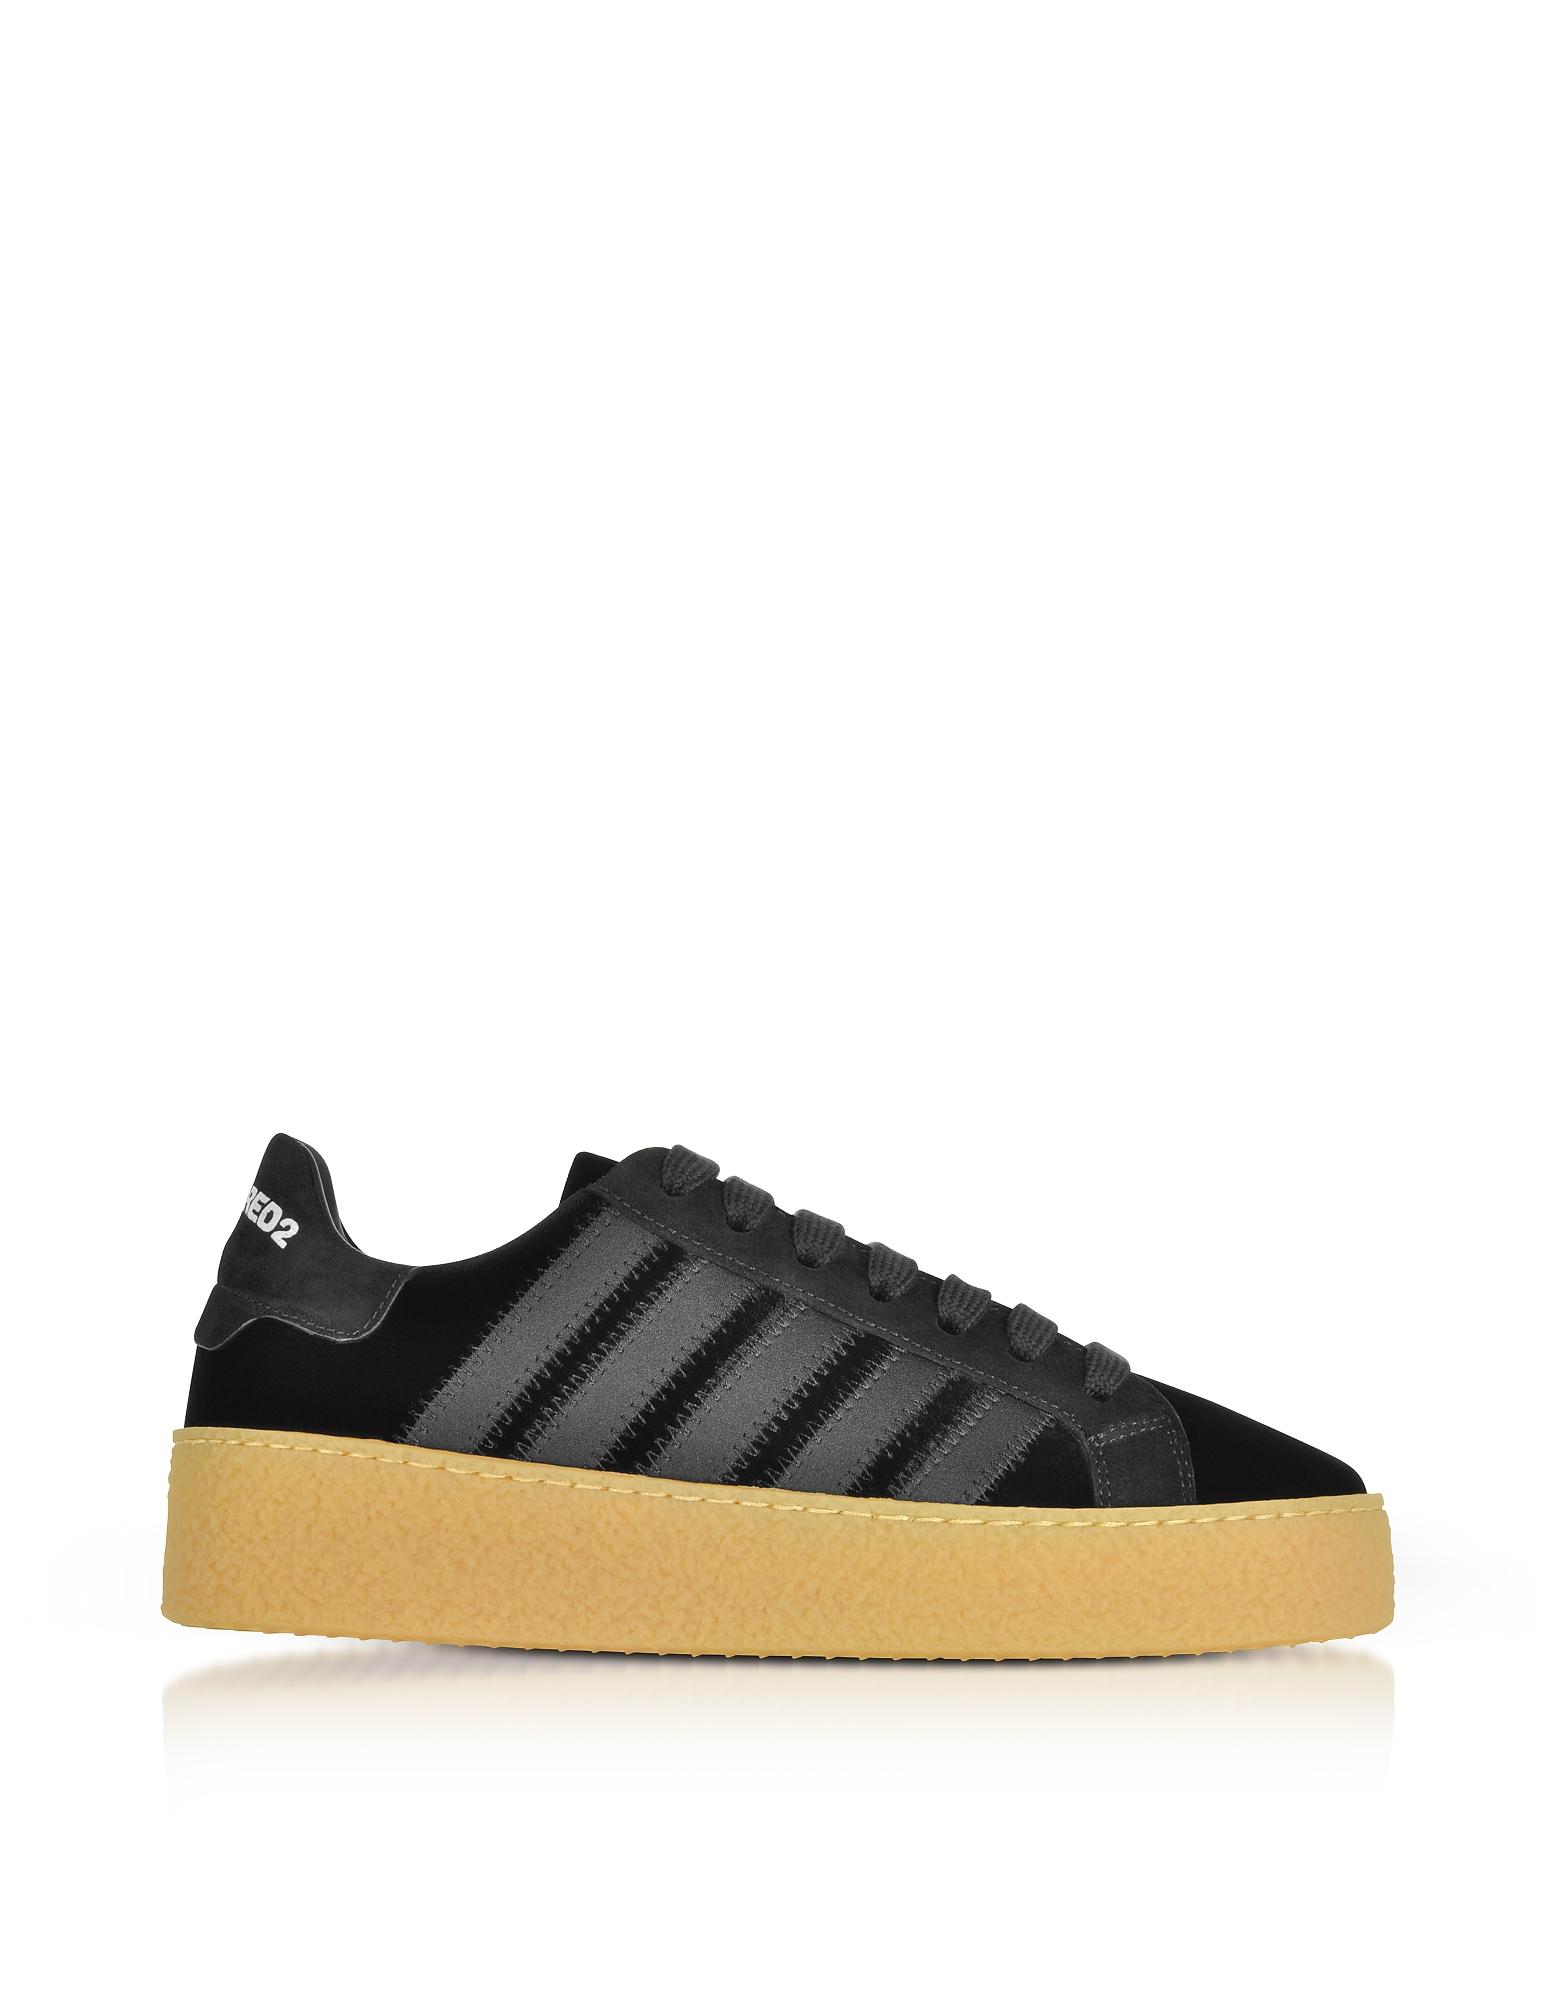 DSquared2 Shoes, Black Velvet and Satin Women's Sneakers